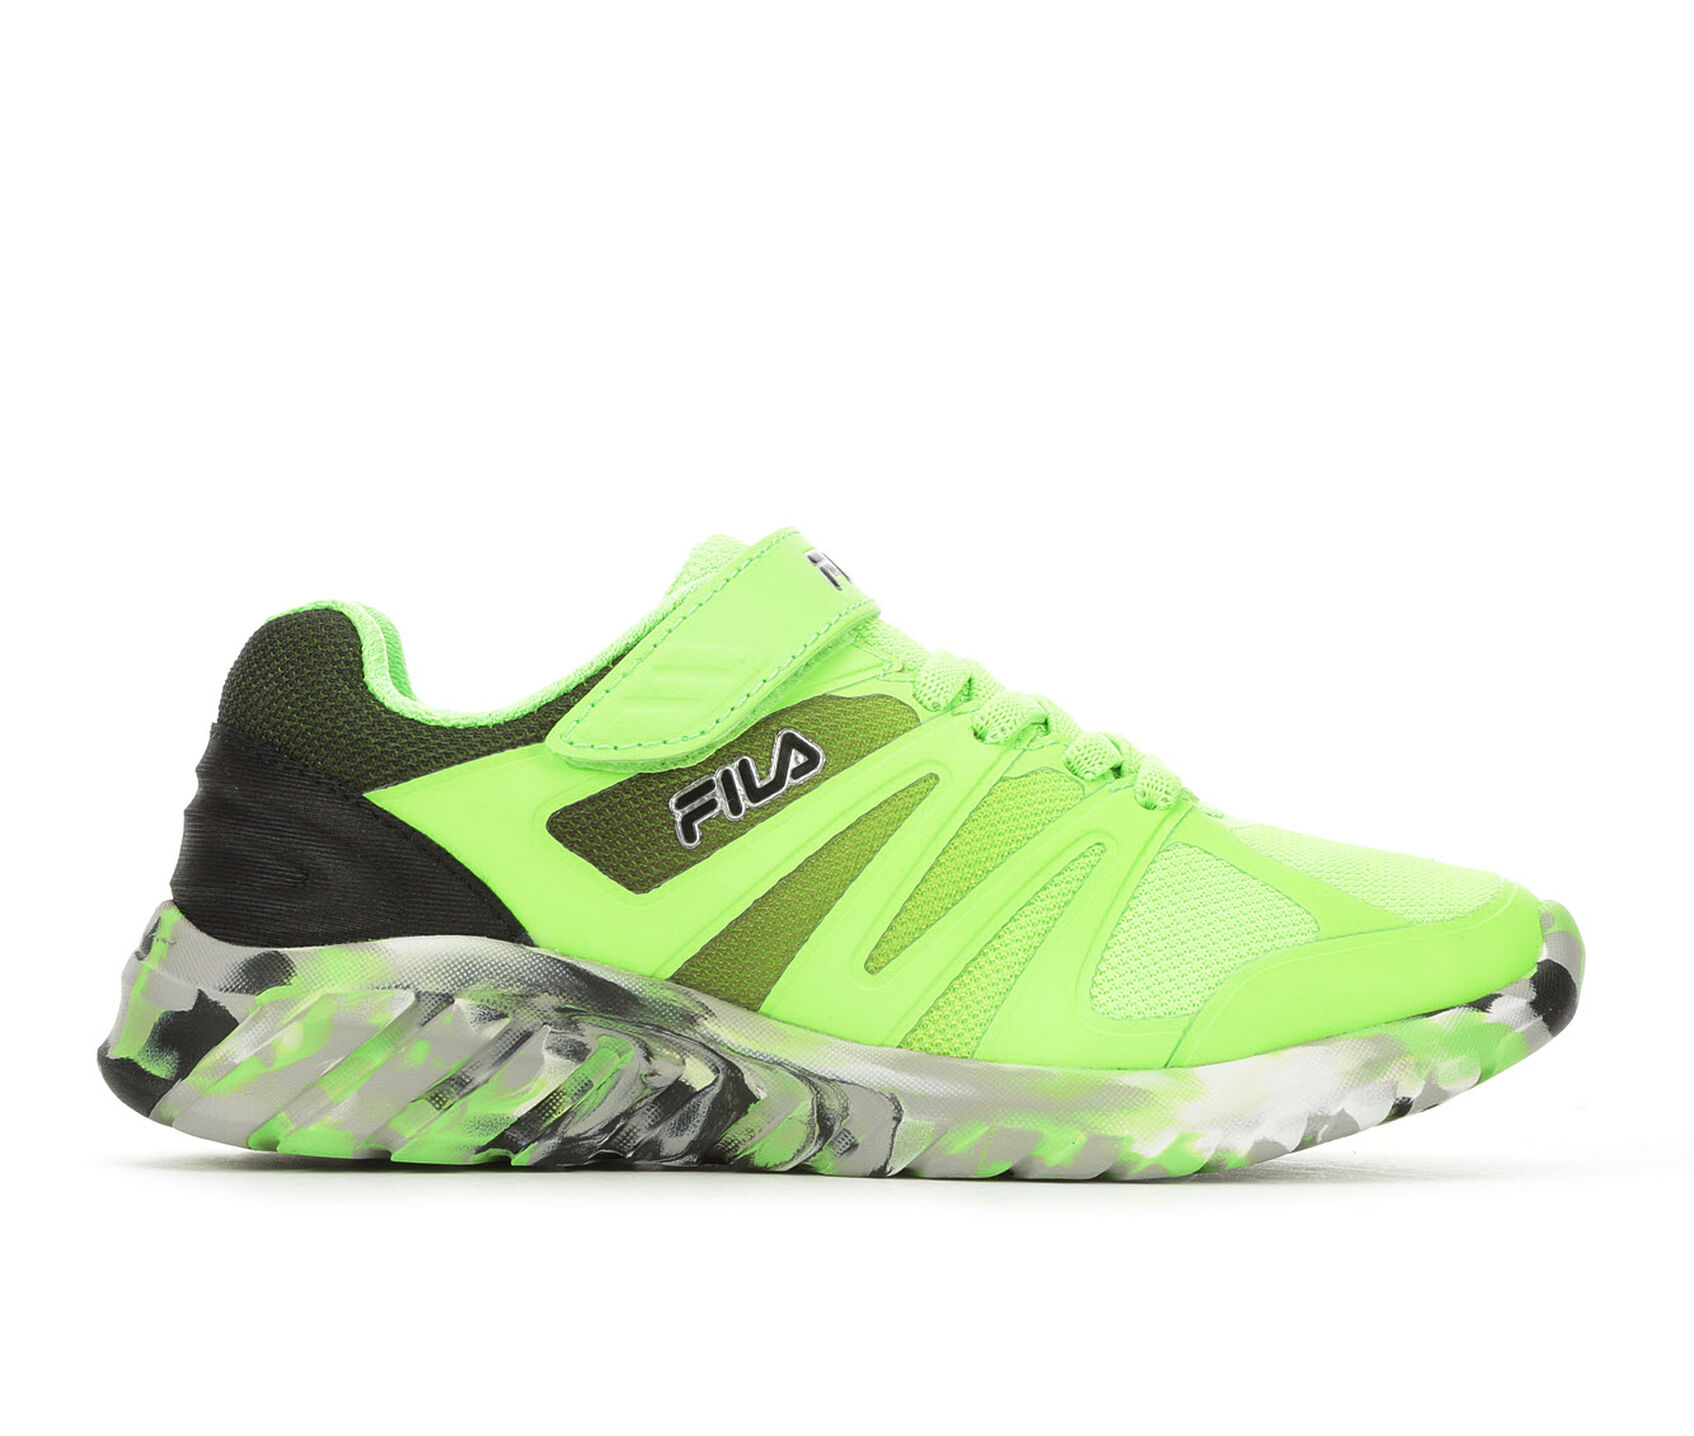 d78af1f28268 Boys' Fila Little Kid & Big Kid Cryptonic 3 Strap Running Shoes ...